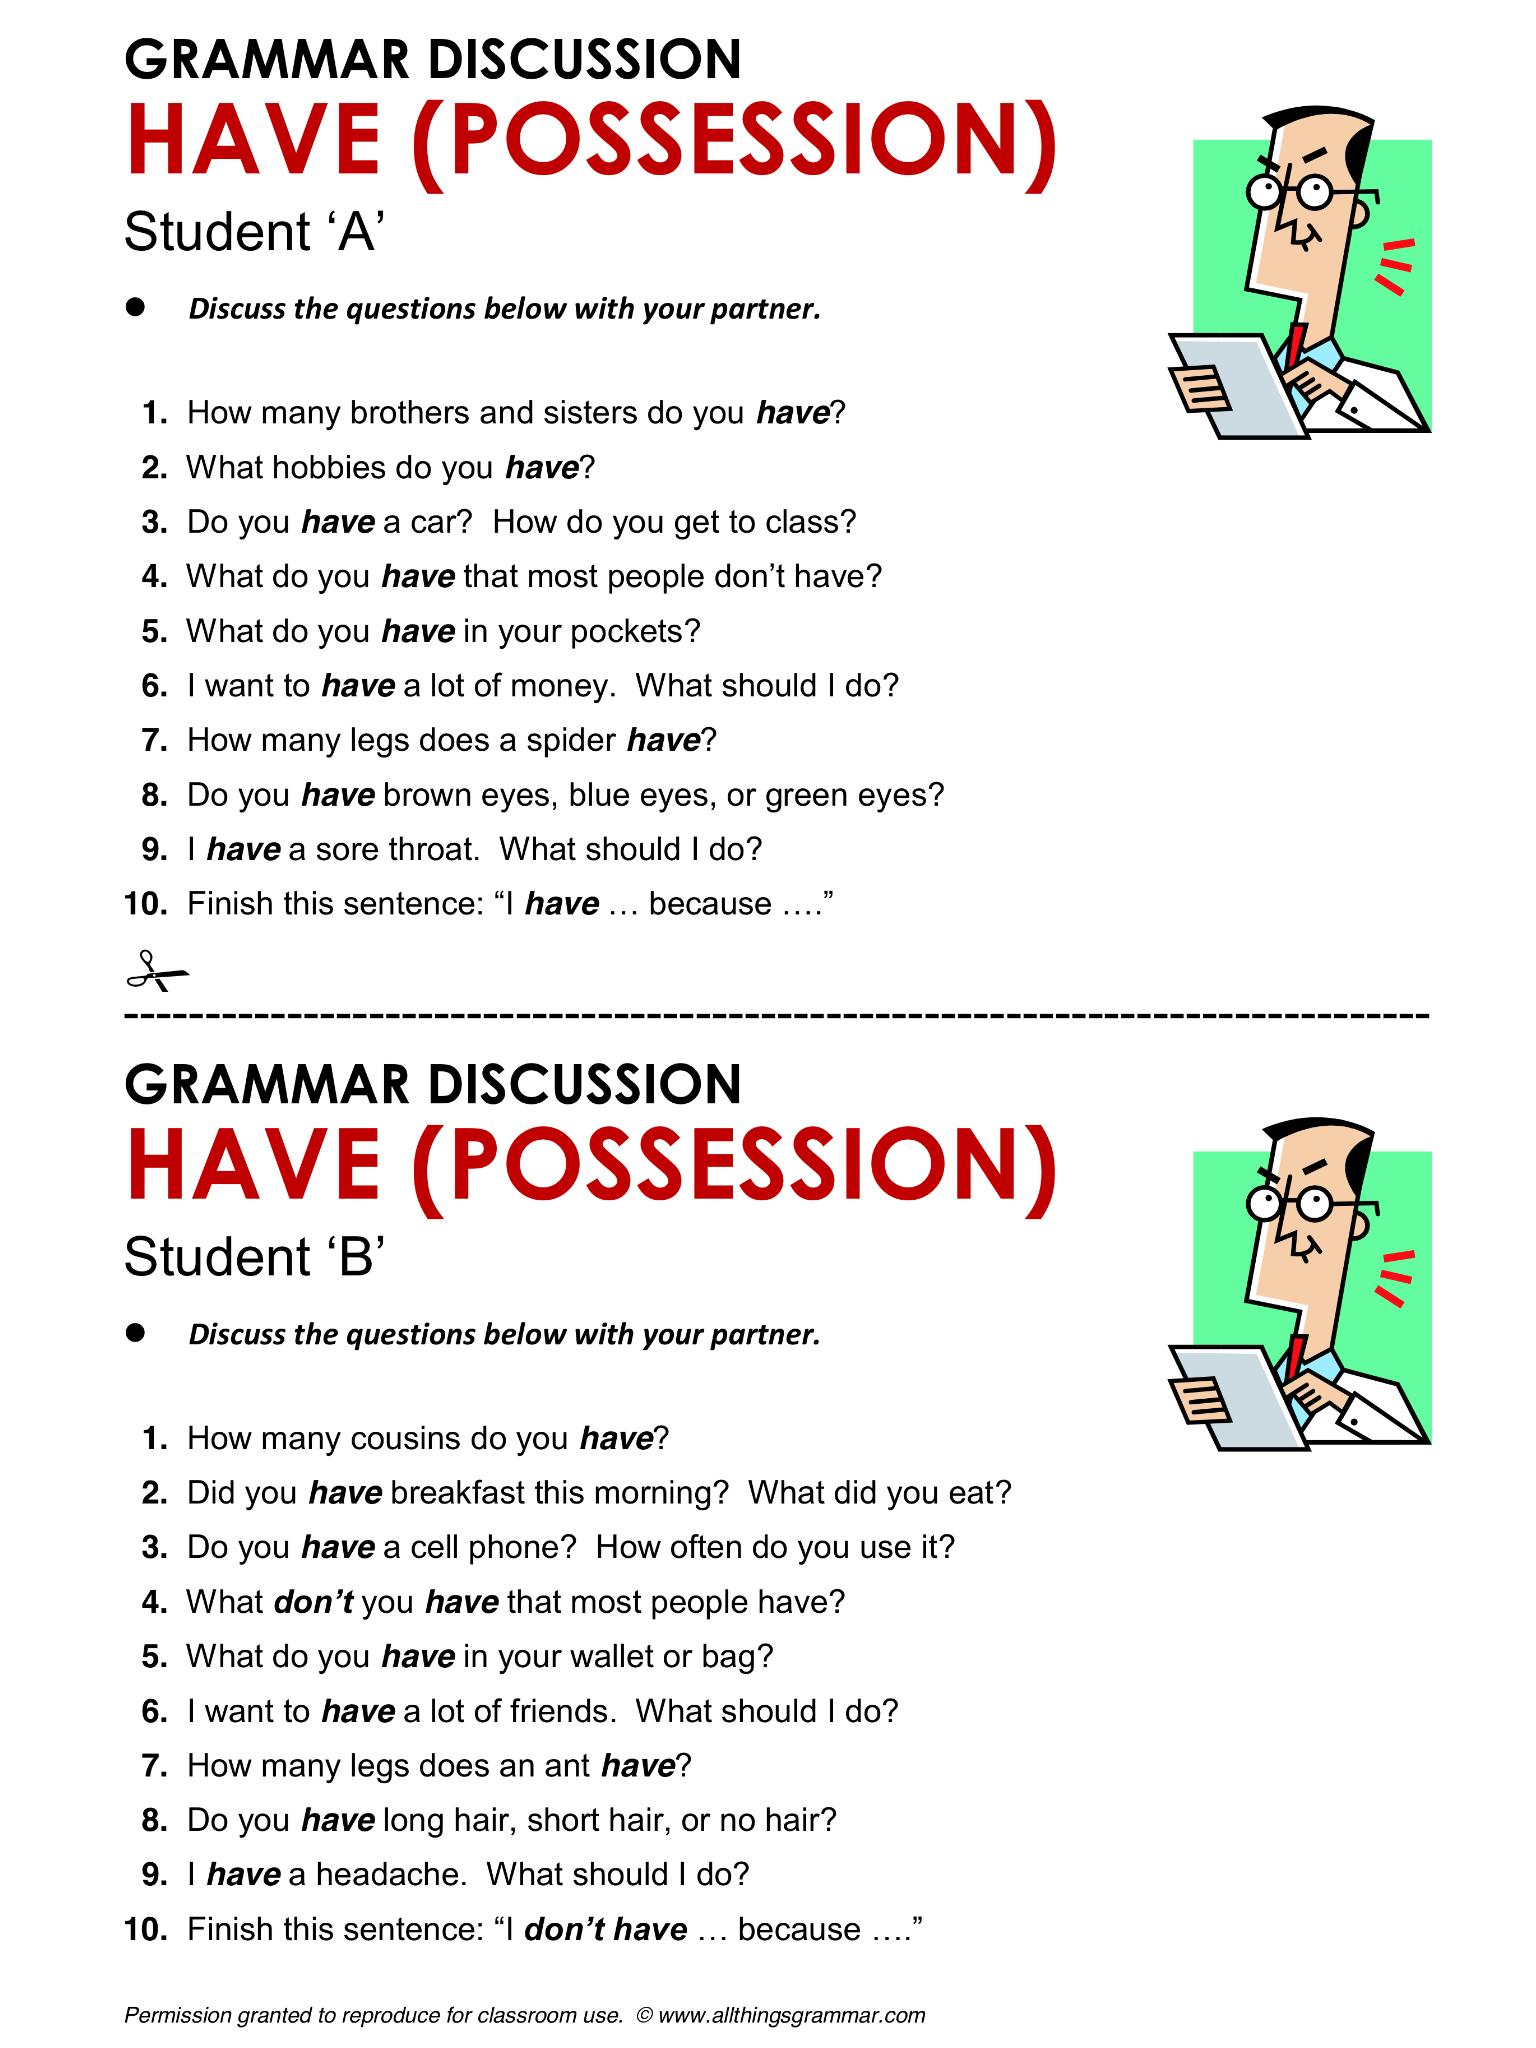 English Grammar Have Possession Lthingsgrammar